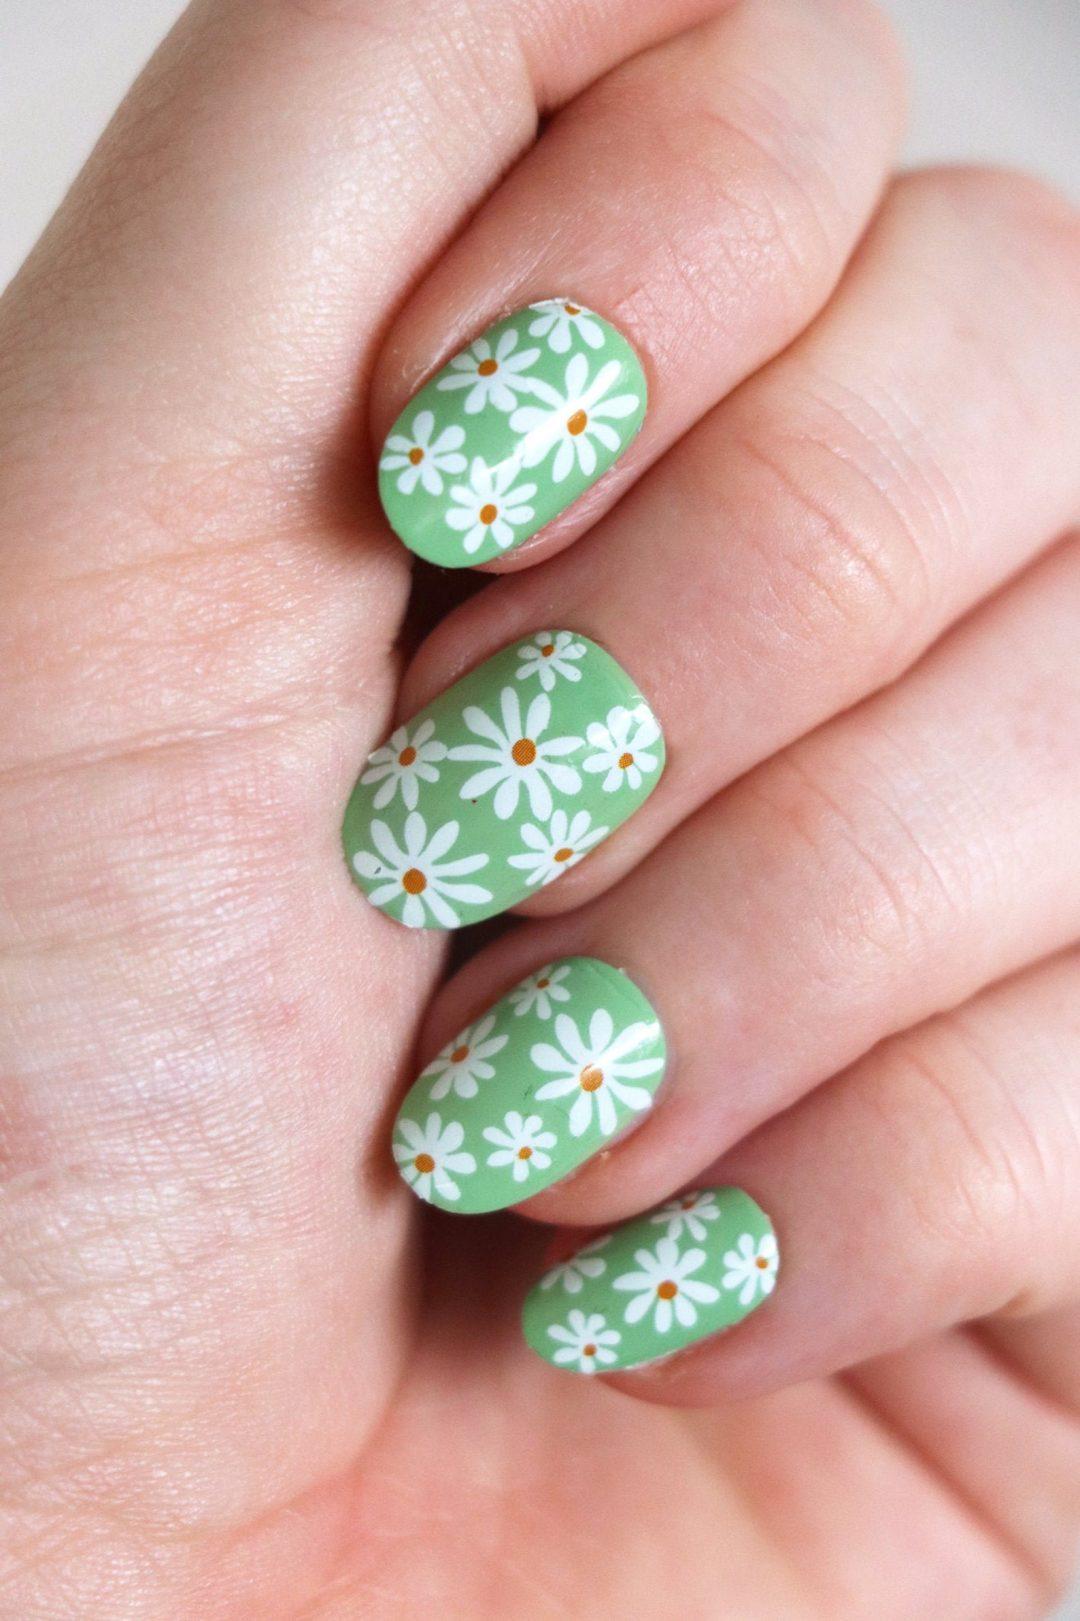 Green floral nails and daisies